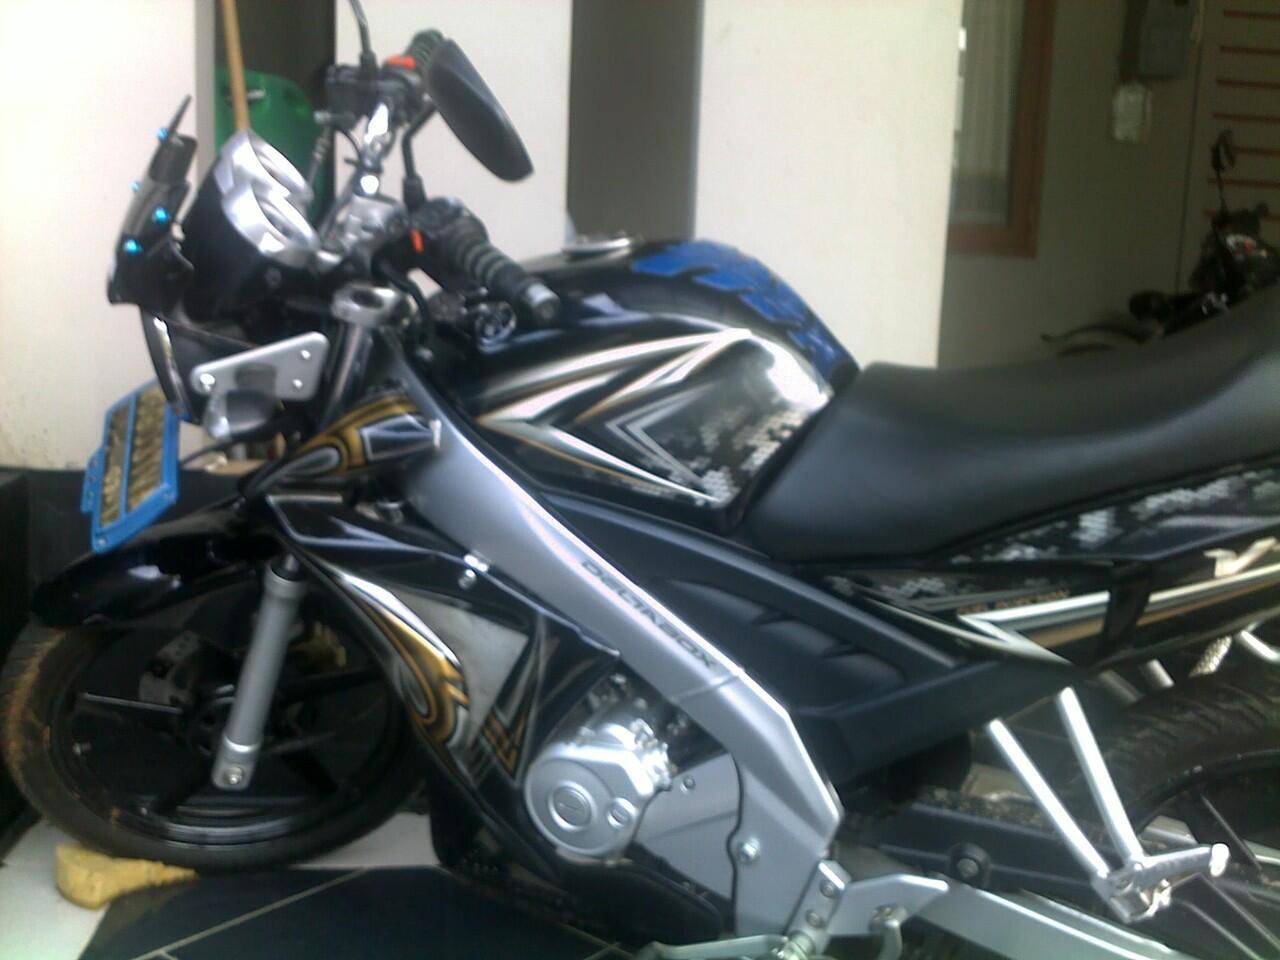 Yamaha Vixion 2009 - Black (Jarang Pakai)